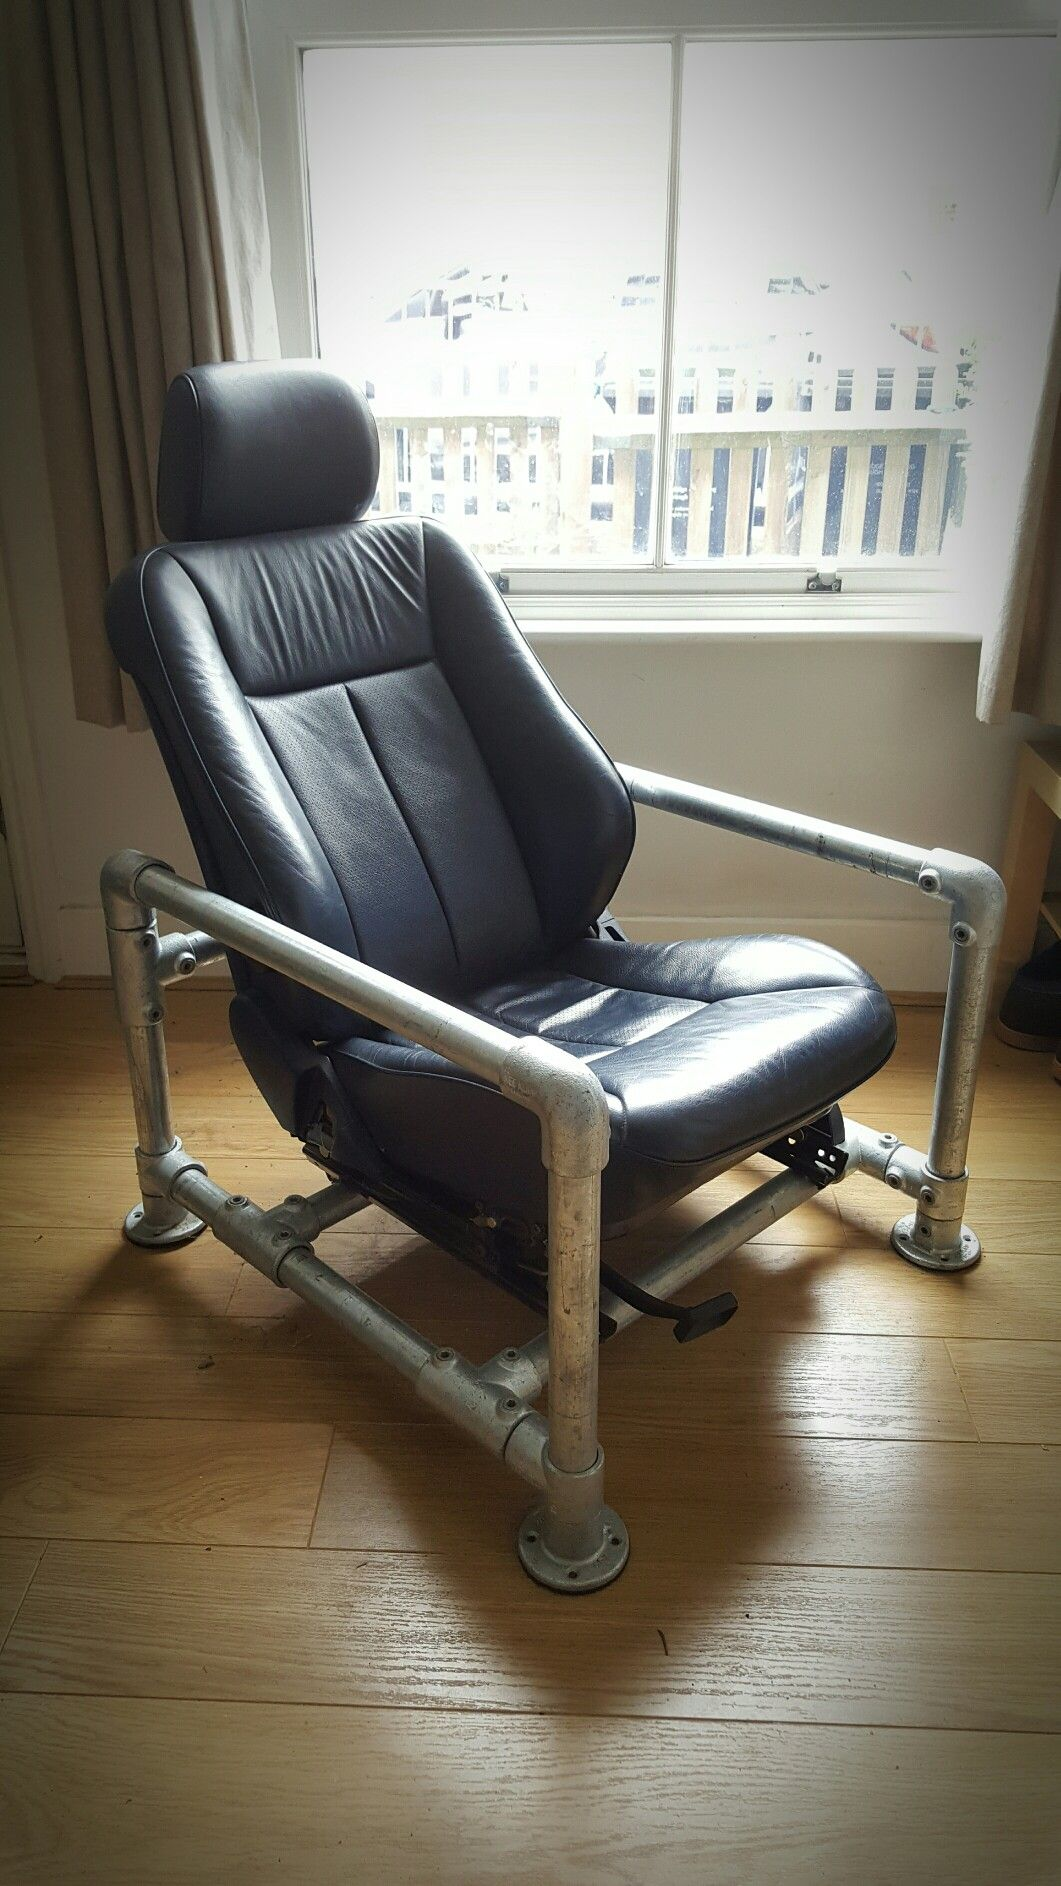 Keeklamp Car Seat Man Chair Ideen Mobil